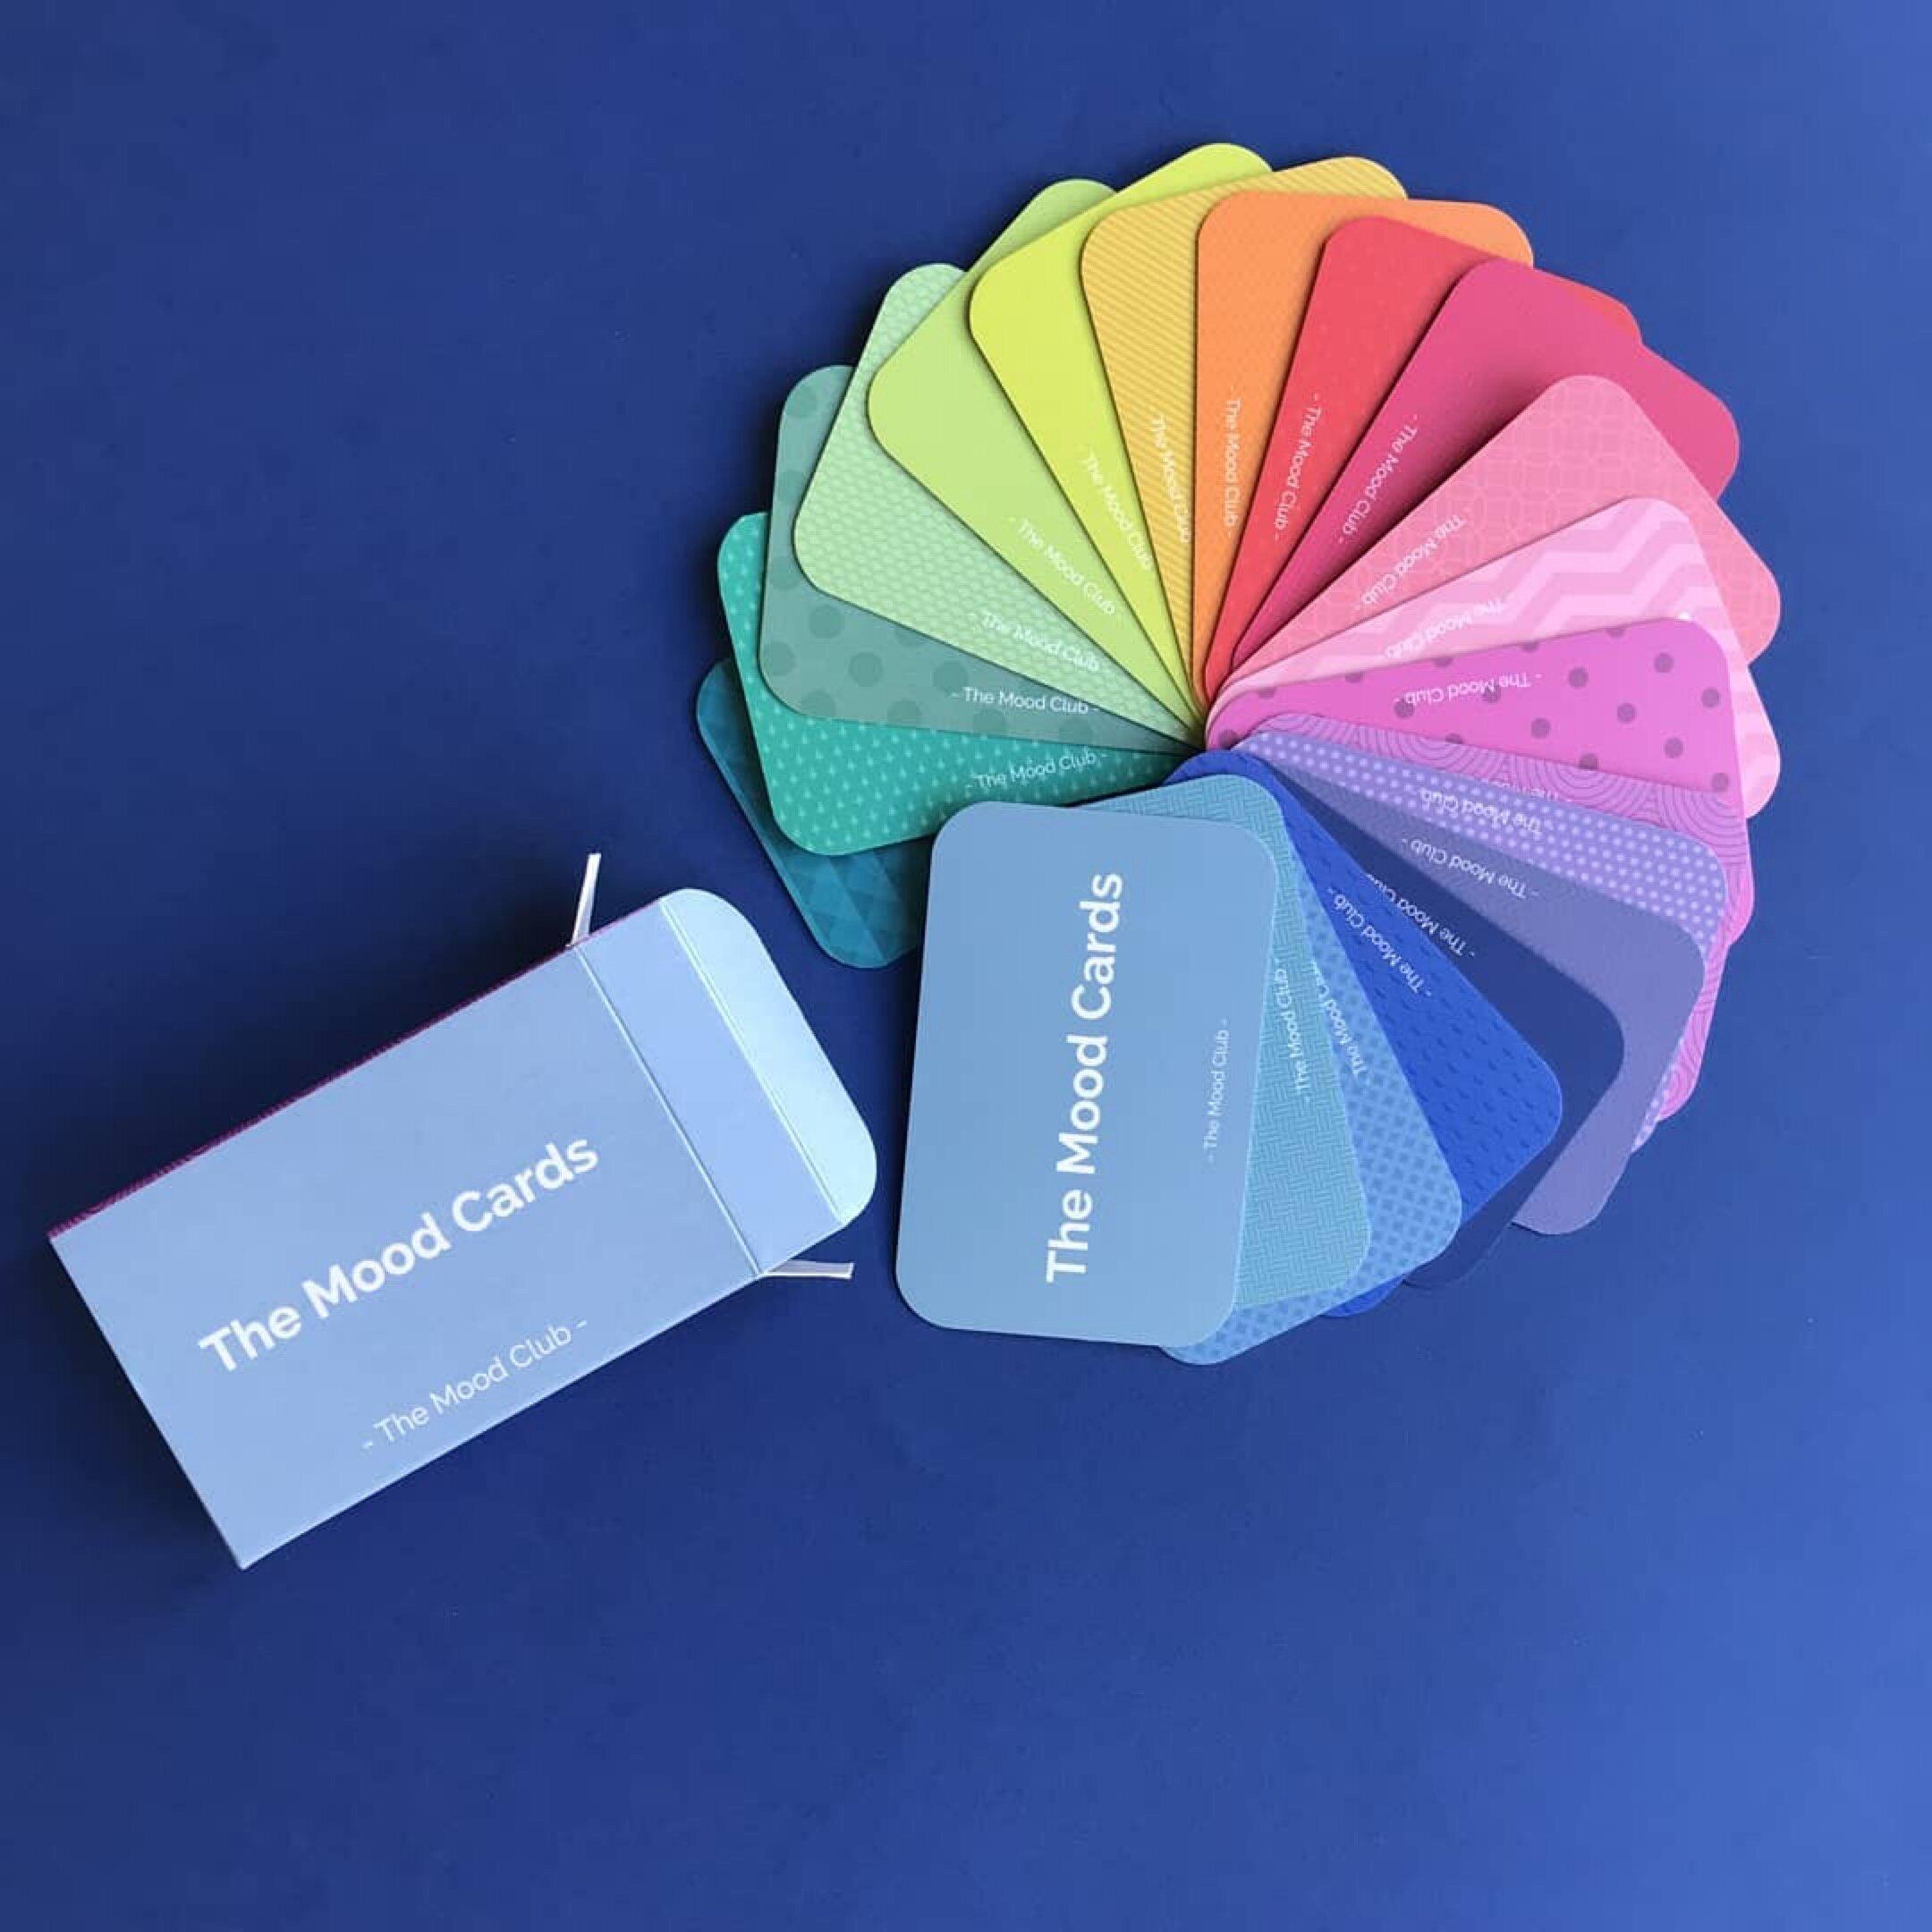 Mood Boosting Cards: The Mood Club